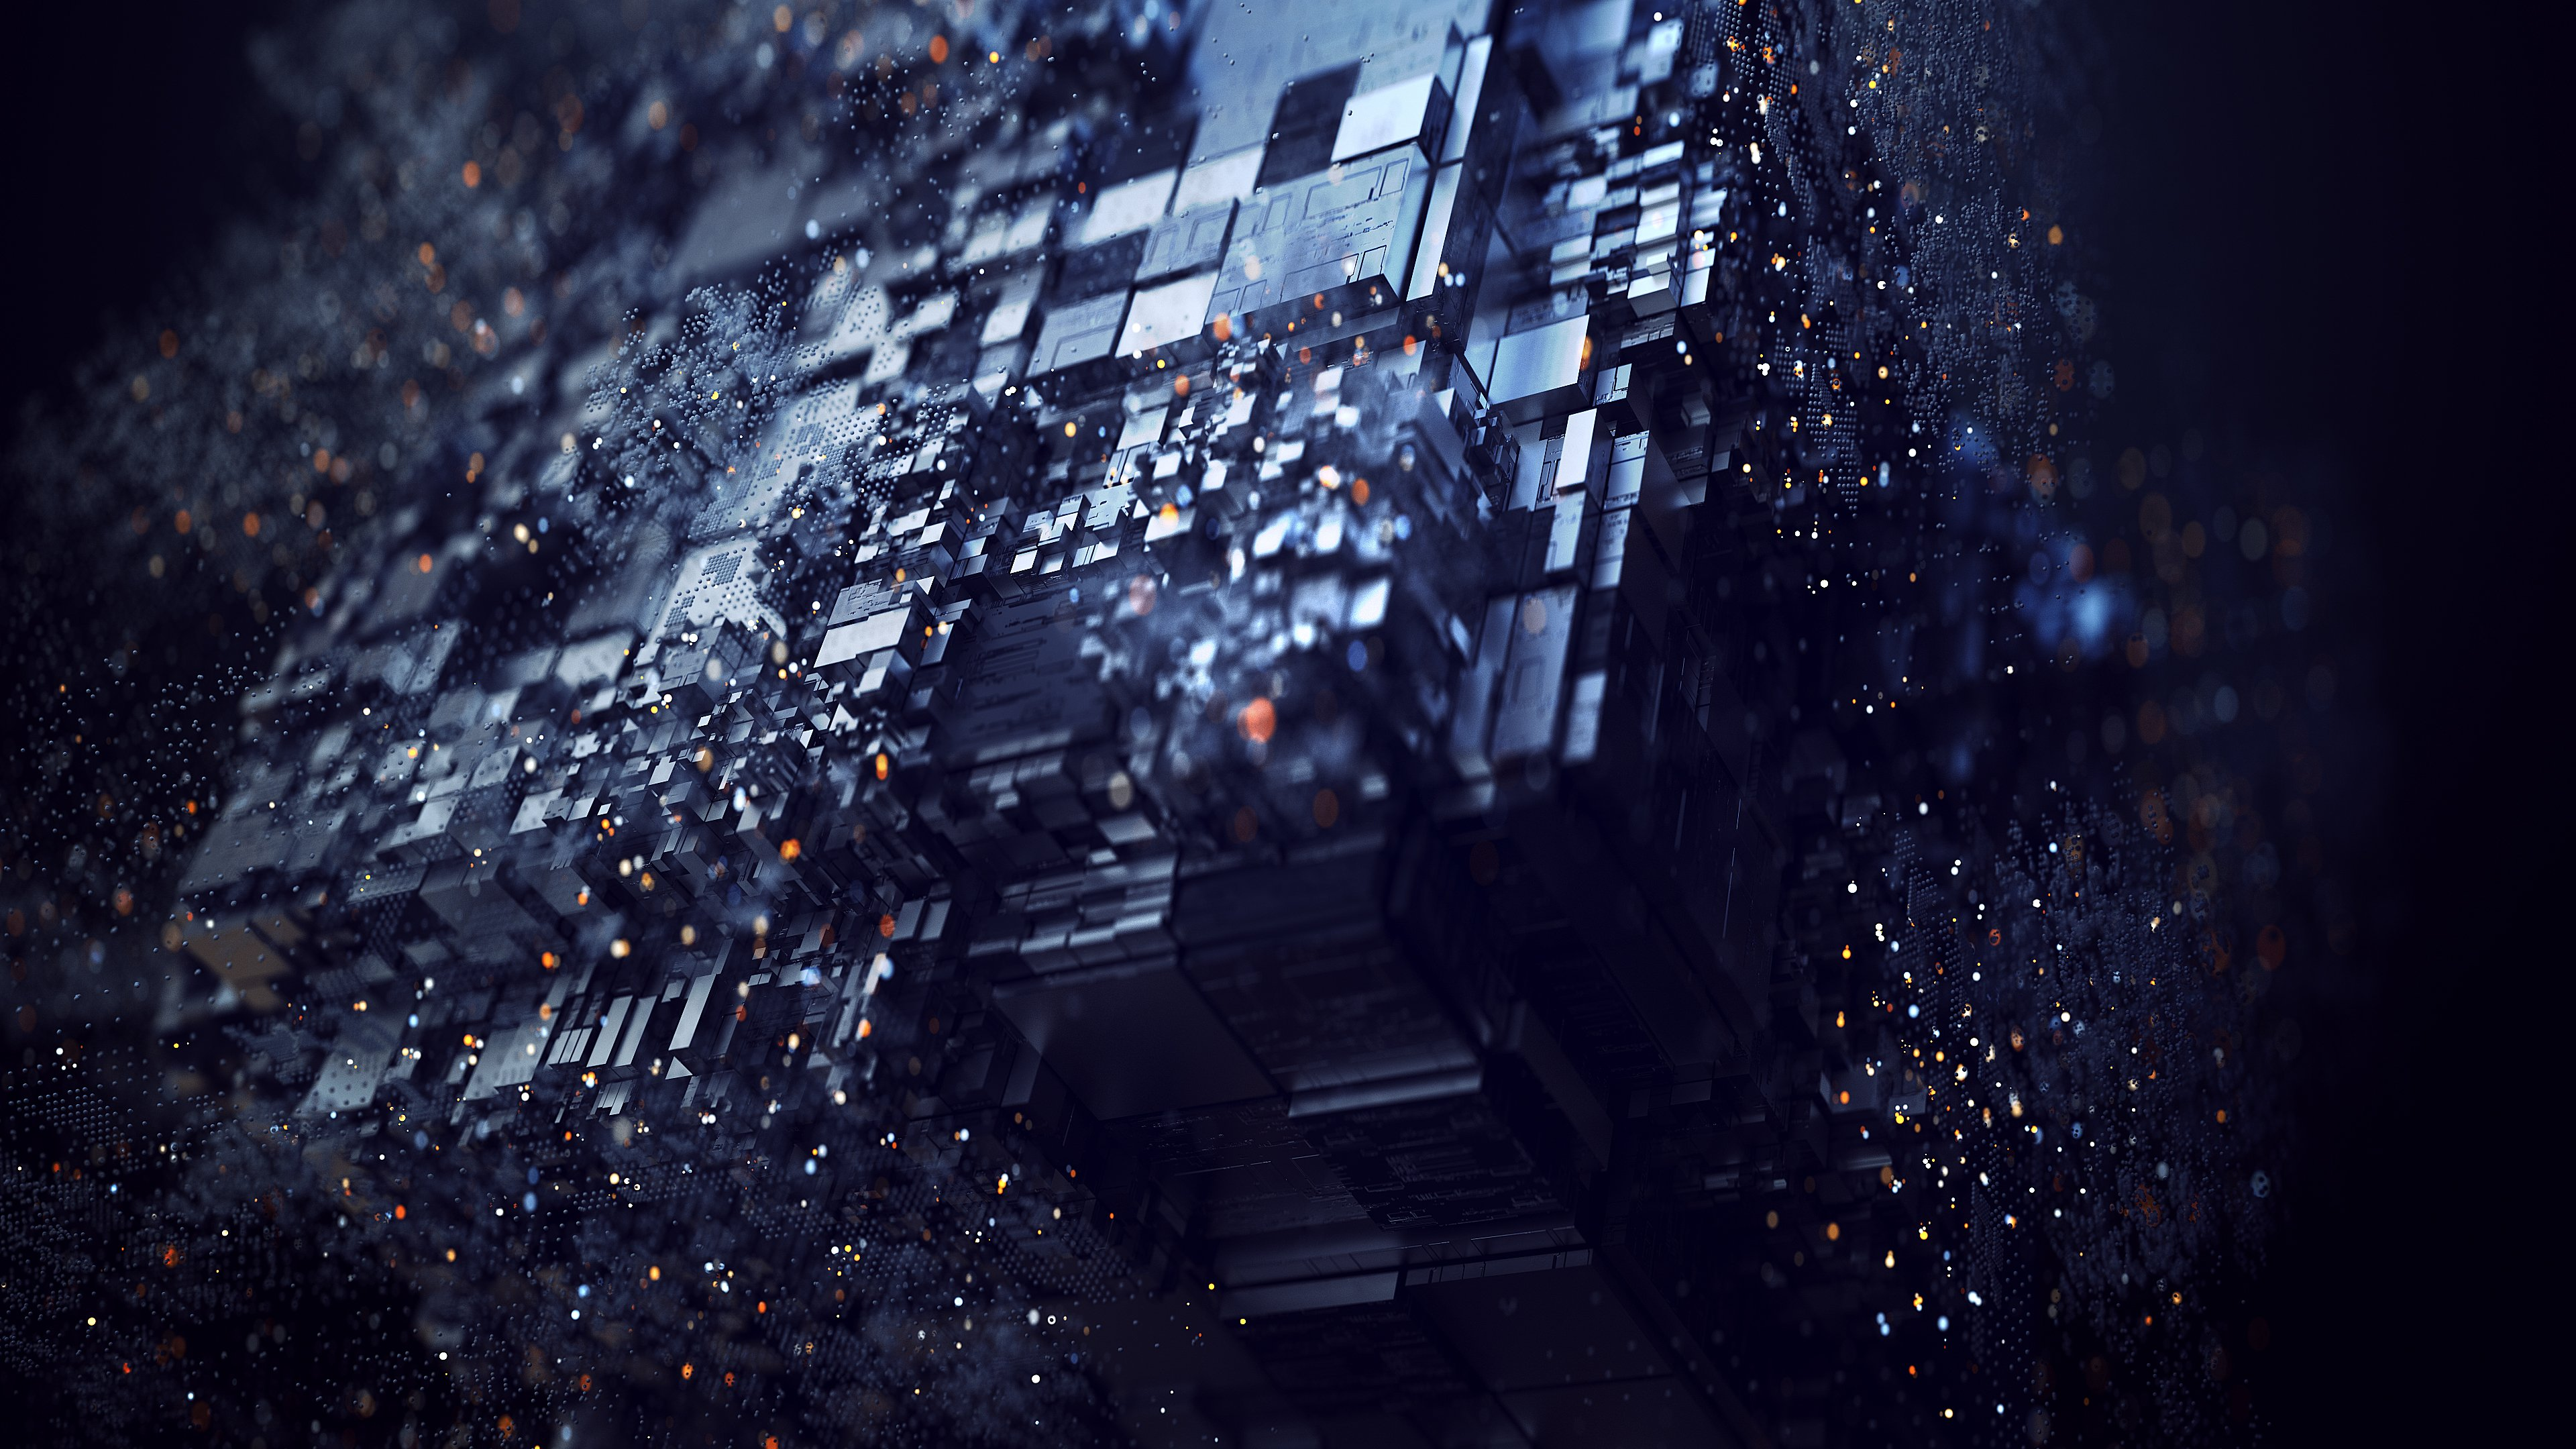 Abstract Digital Art Background - HD Wallpaper